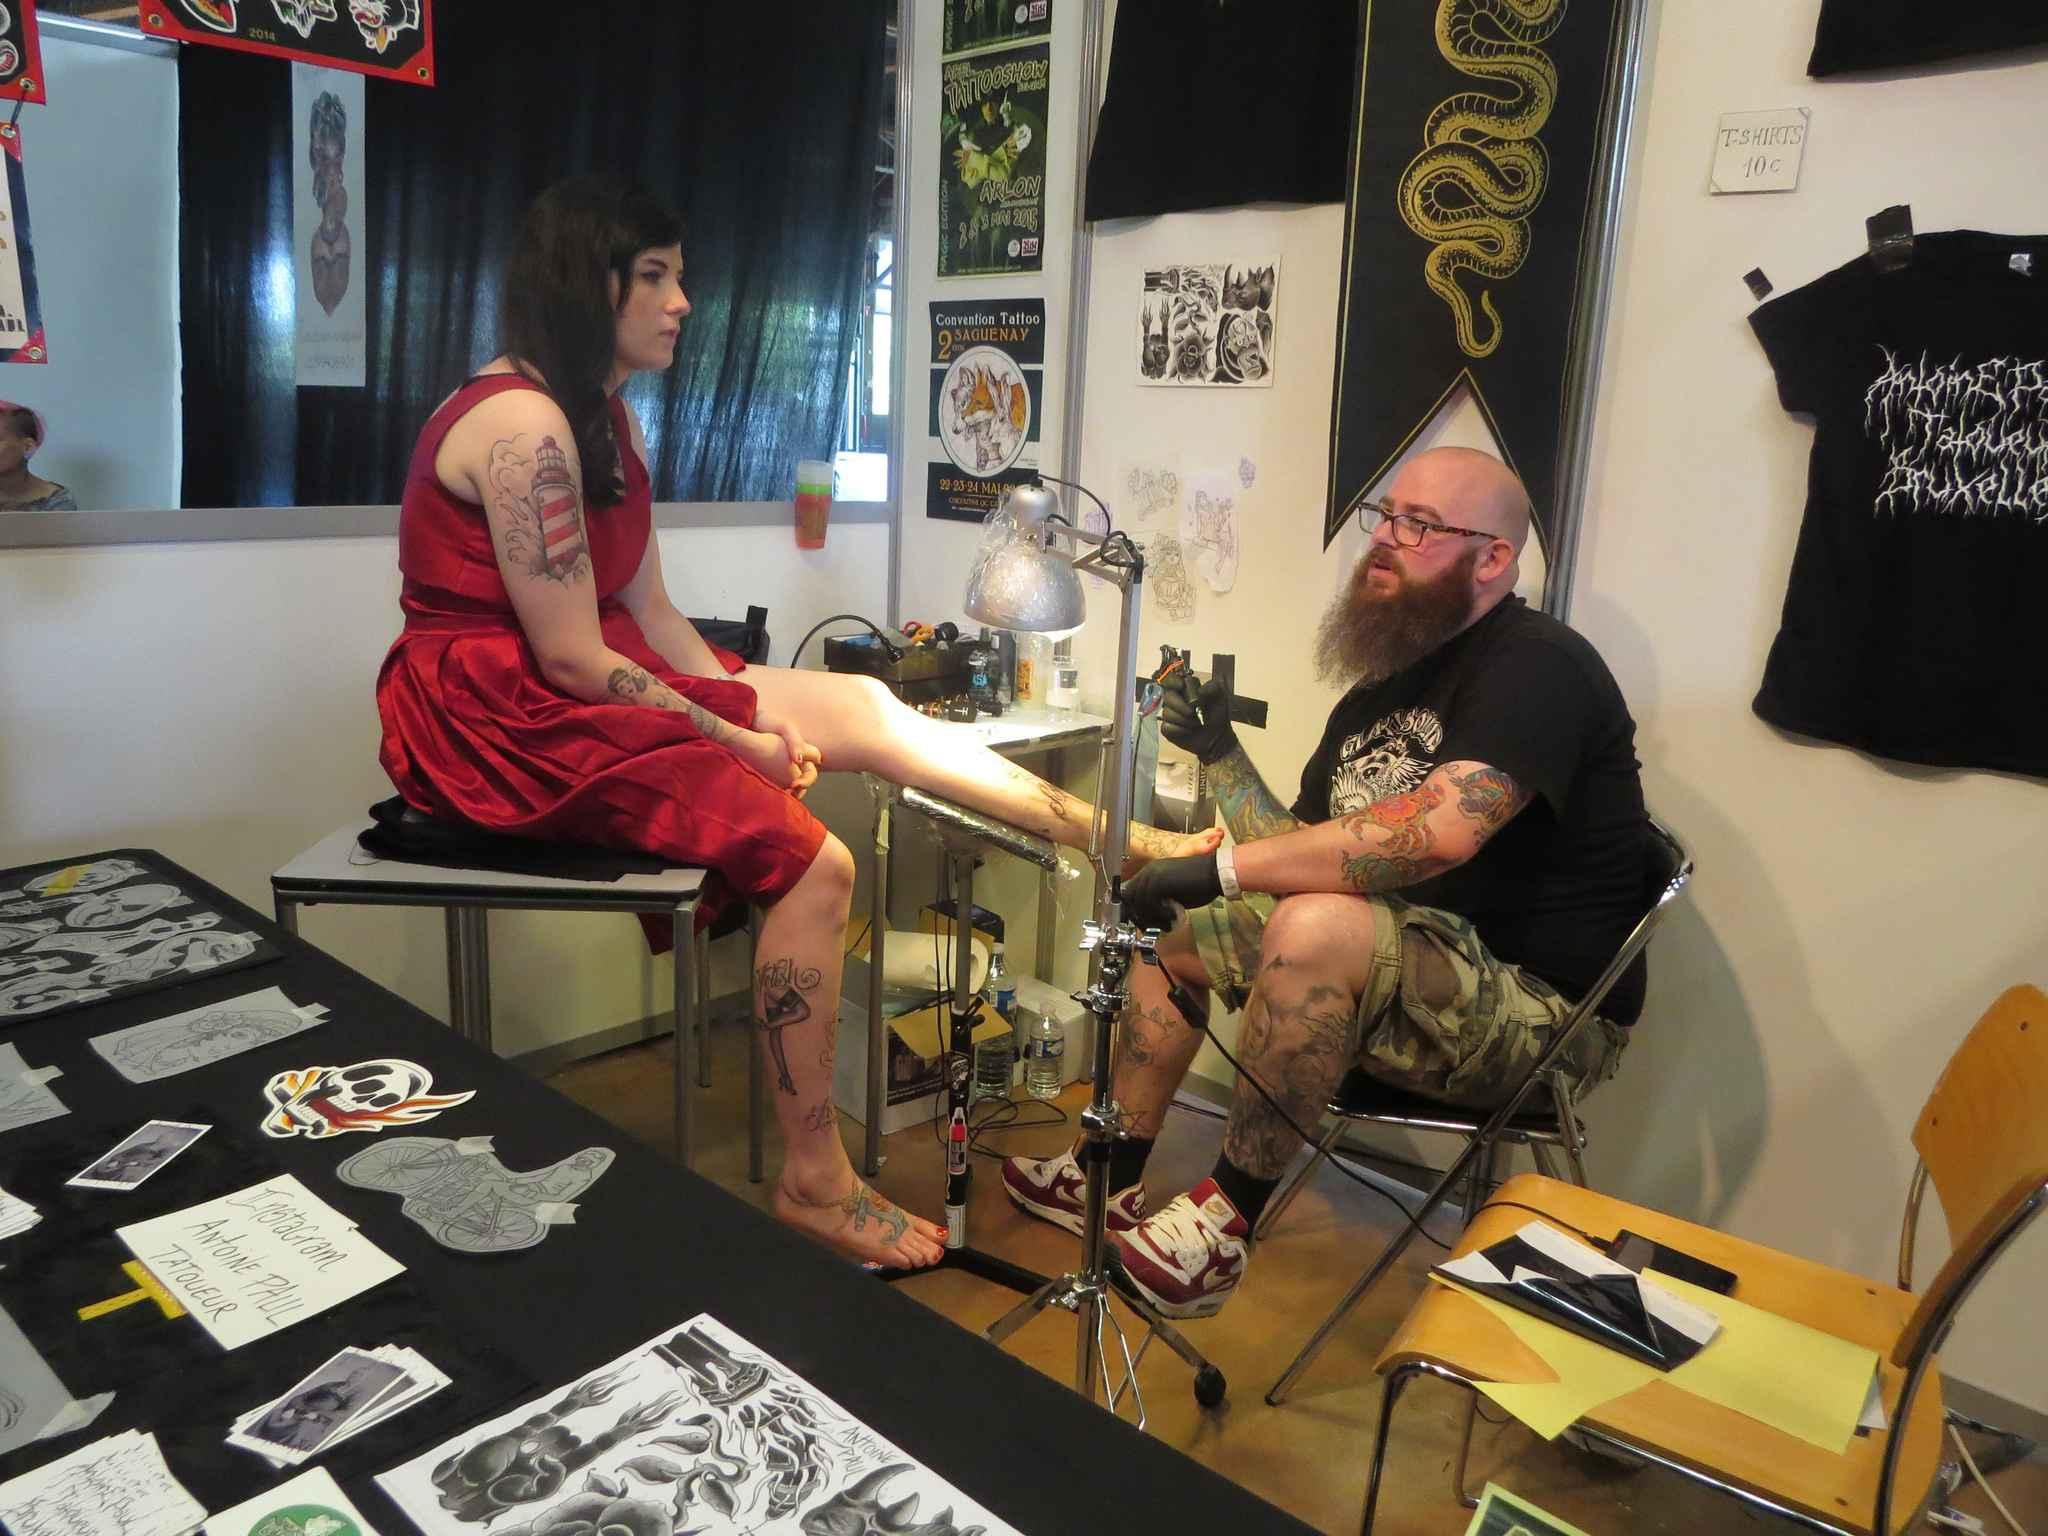 tatouages301 salon du tatouage nantes 2014. Black Bedroom Furniture Sets. Home Design Ideas